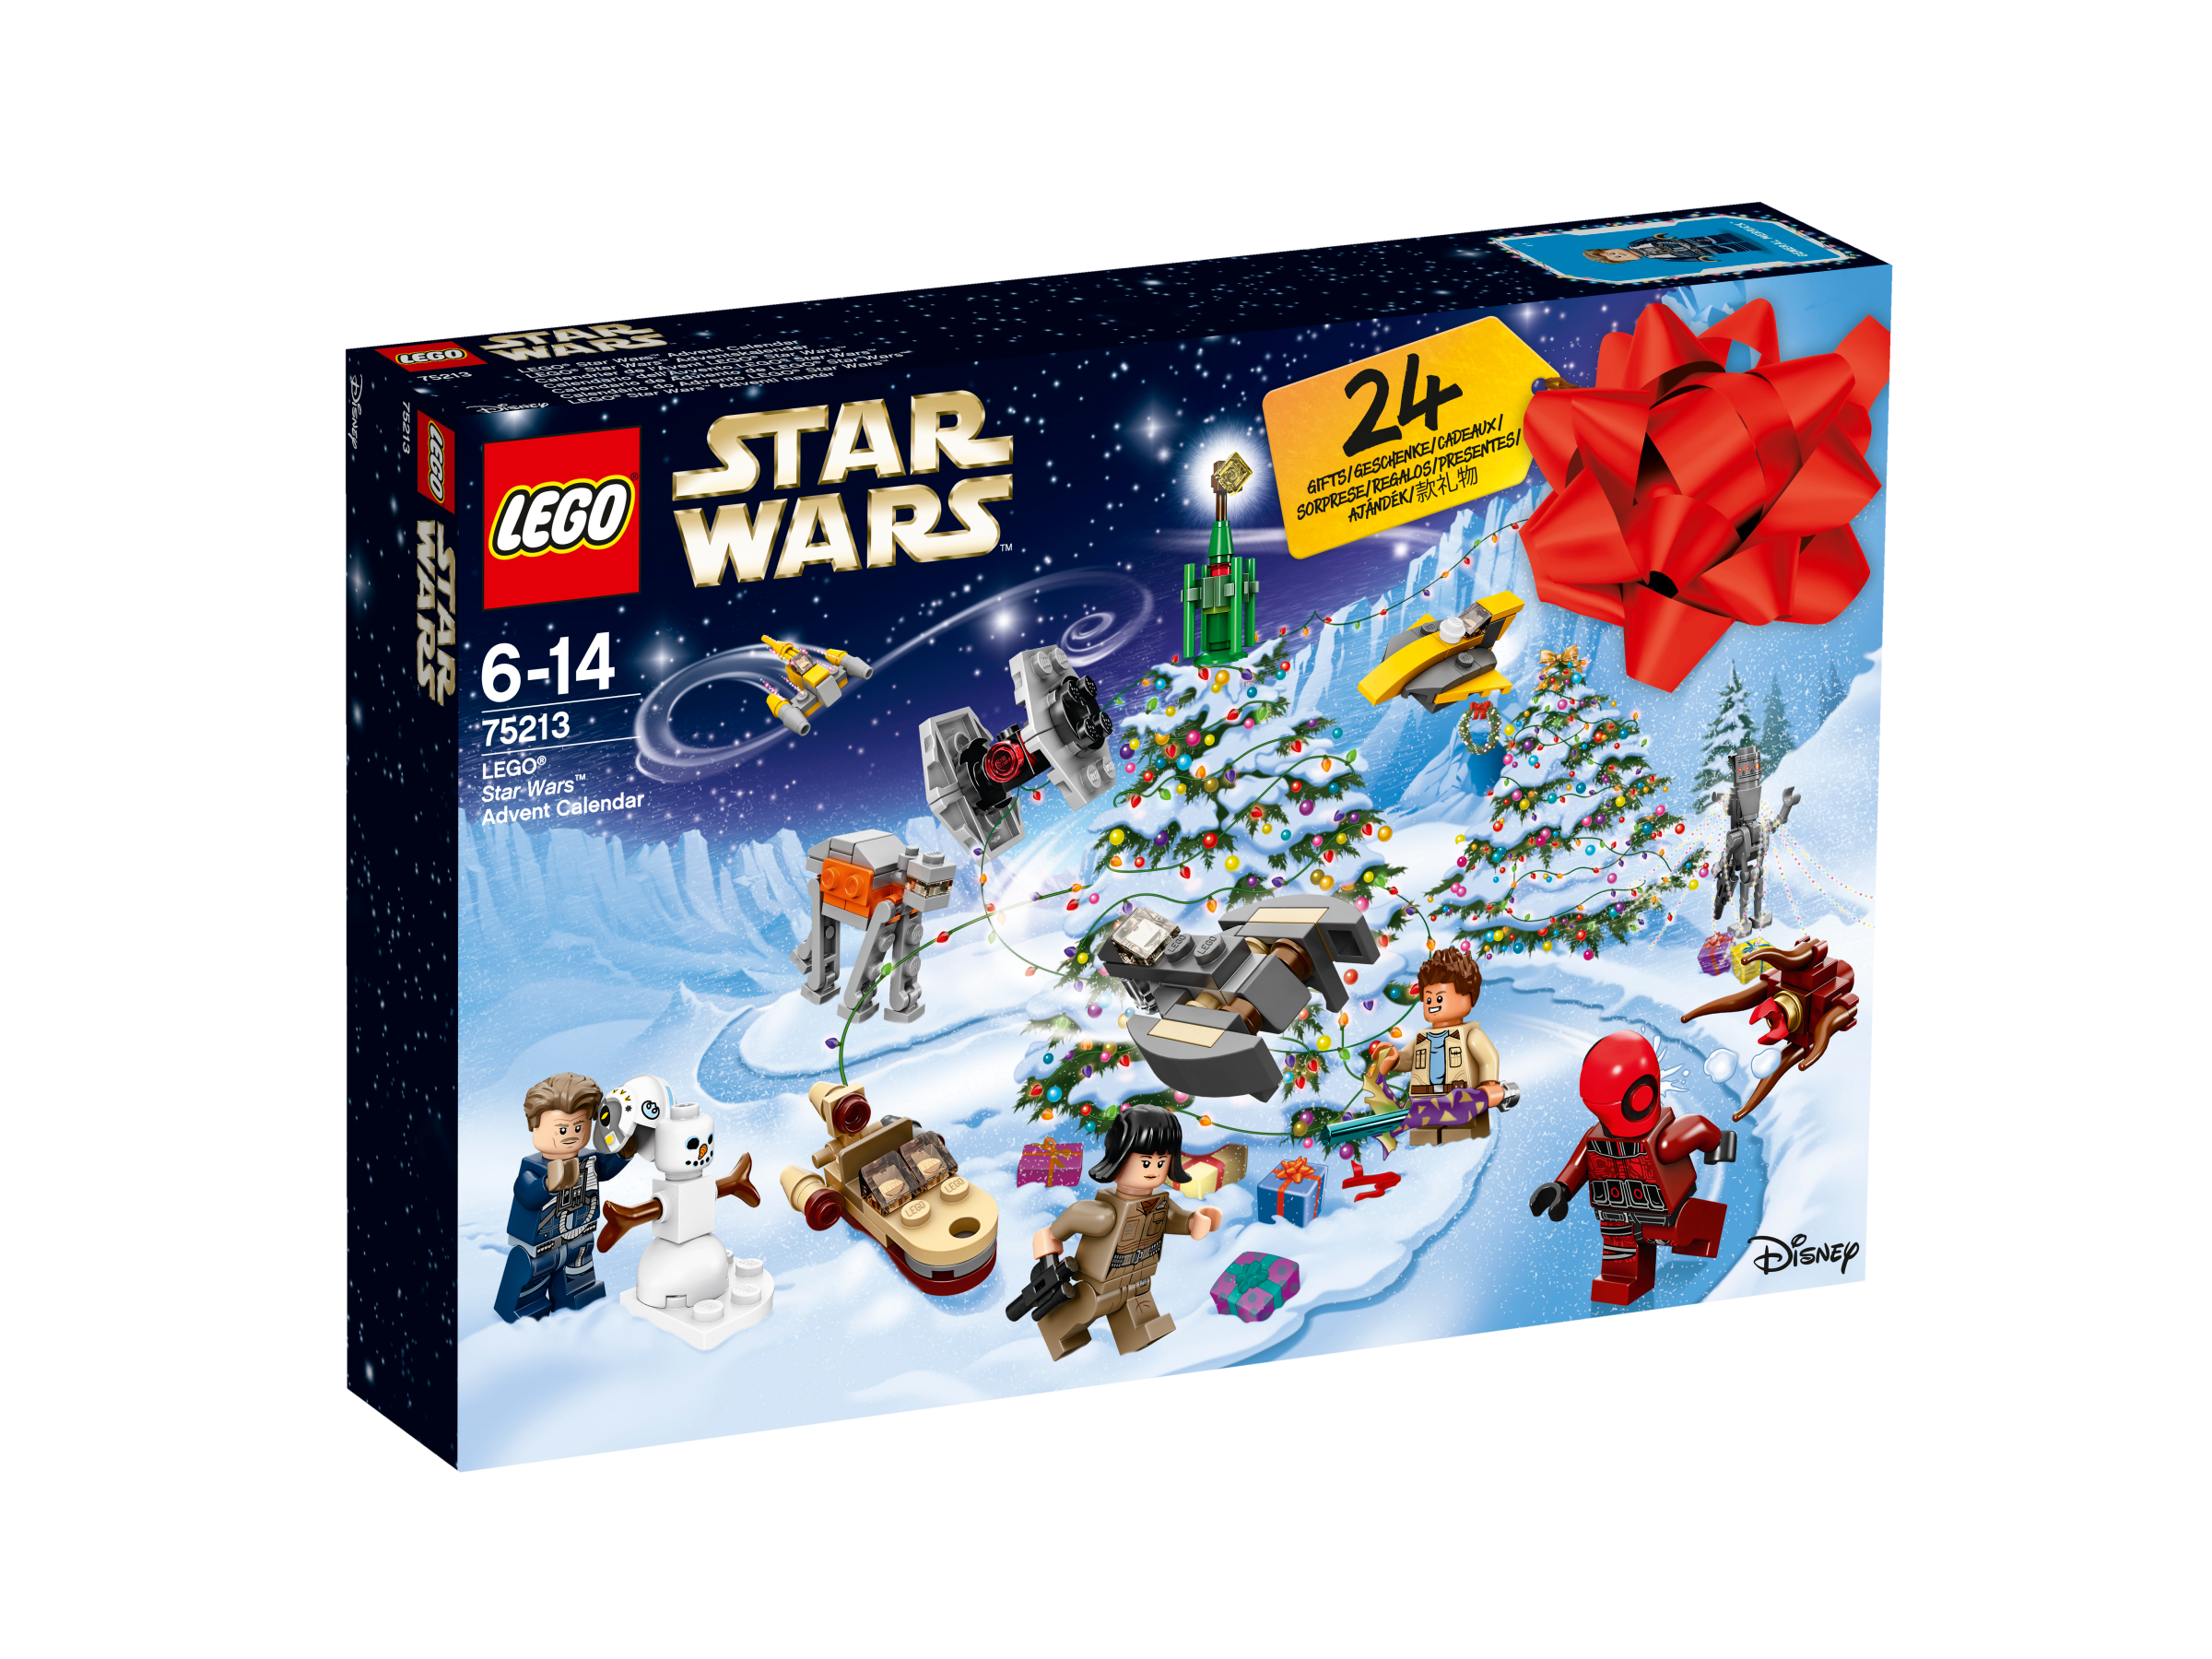 lego_star_wars_75213_adventskalender